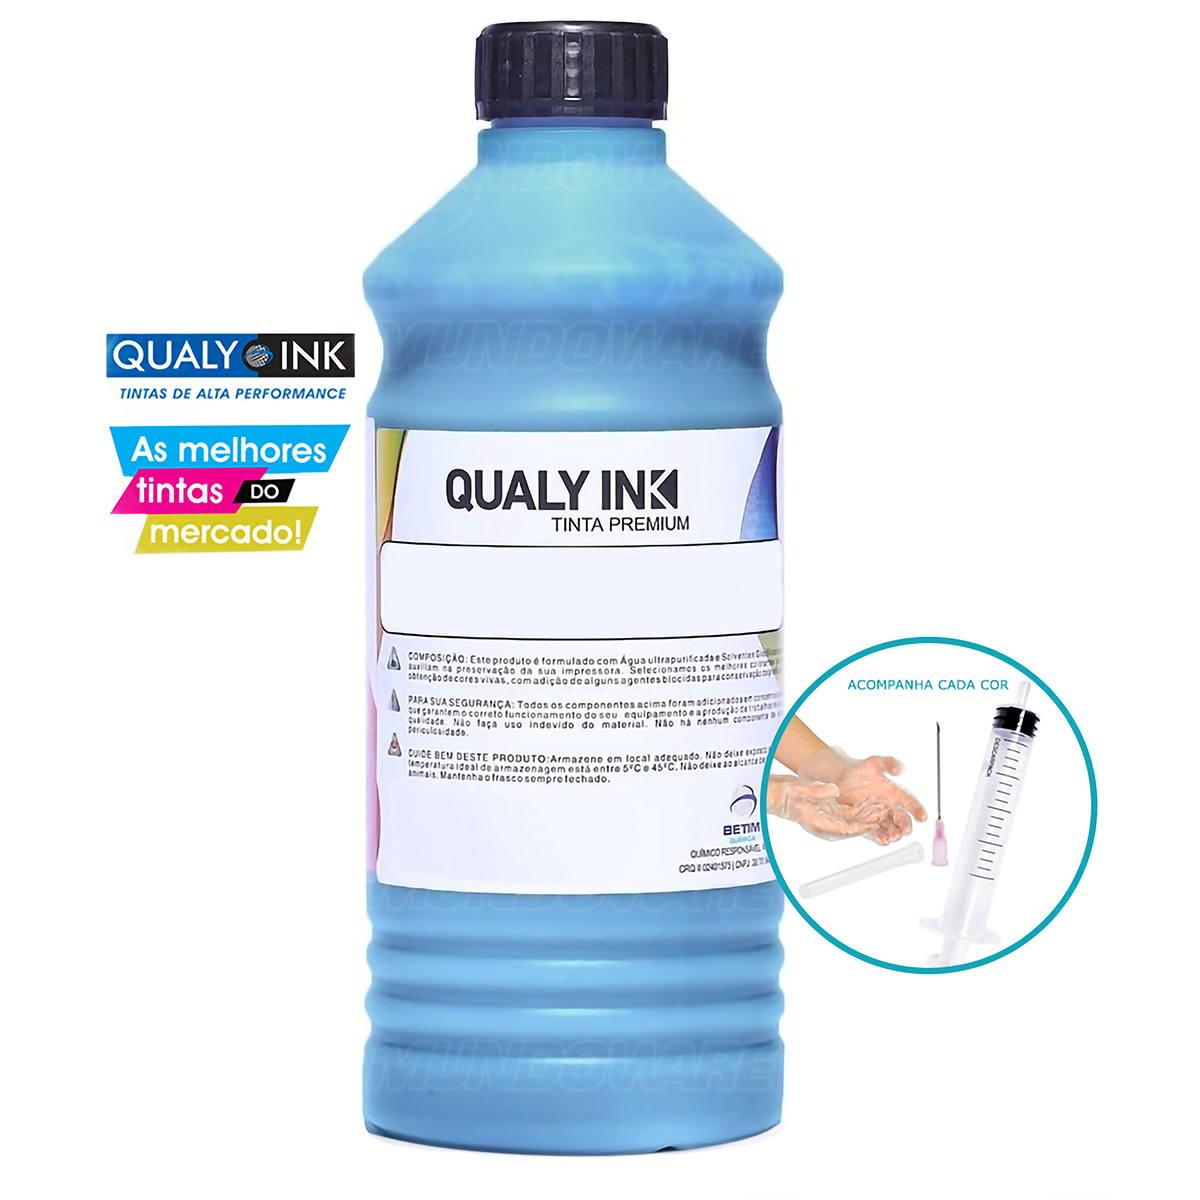 Compatível: Tinta Corante Qualy-Ink CC1H-698 para Recarga de Cartuchos HP série 3000 Ciano 1L